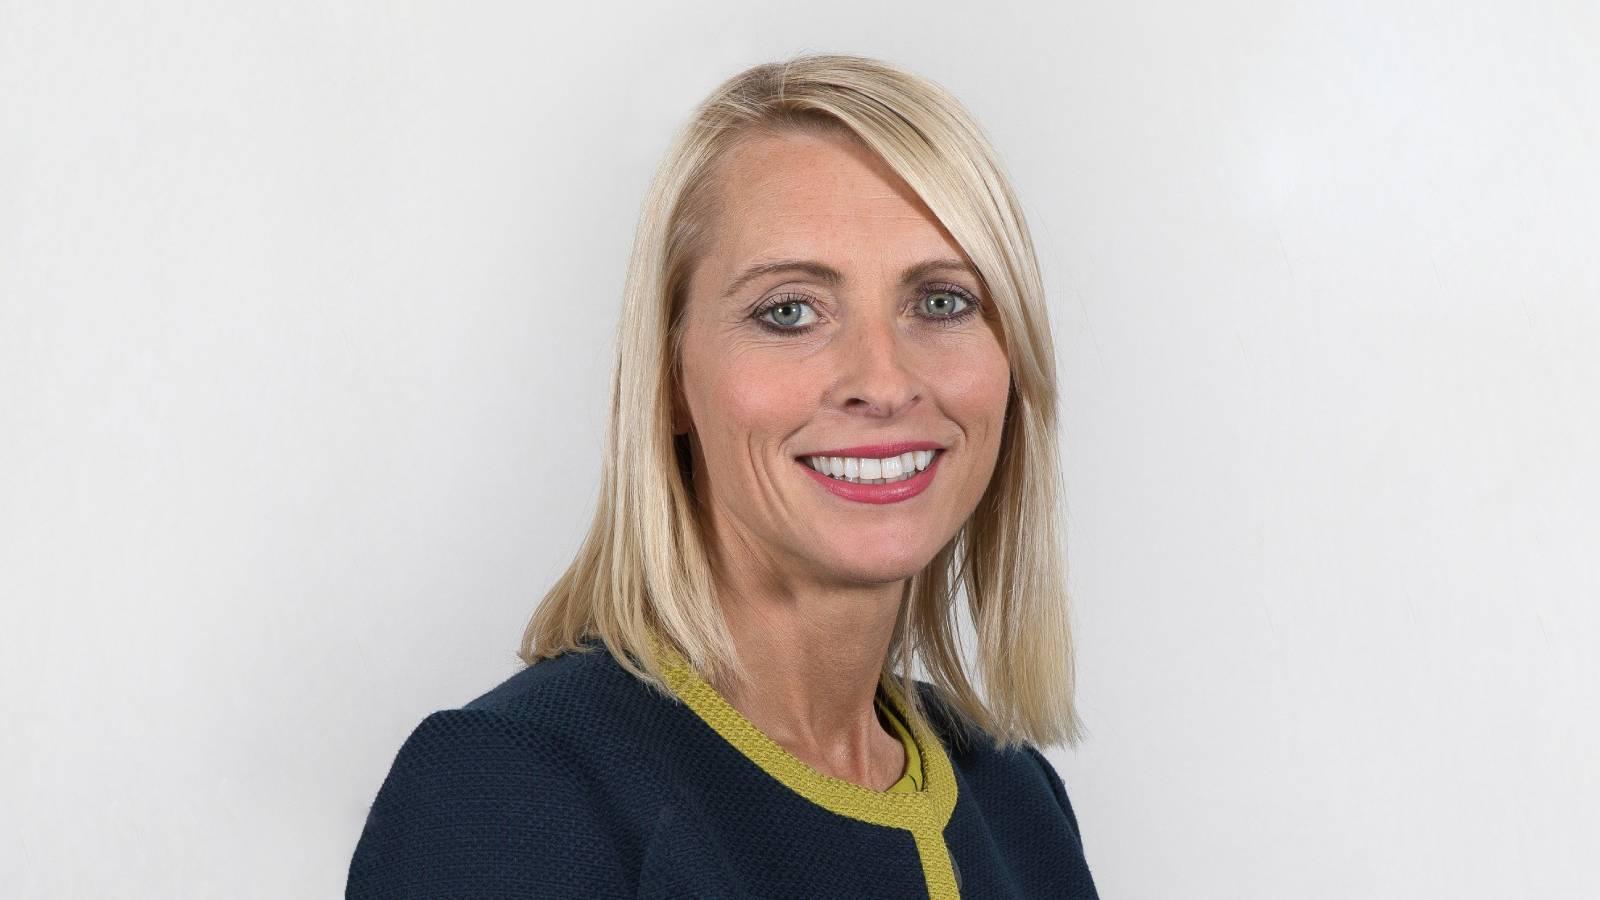 Joanne Howliston, AXA UK North Regional Director